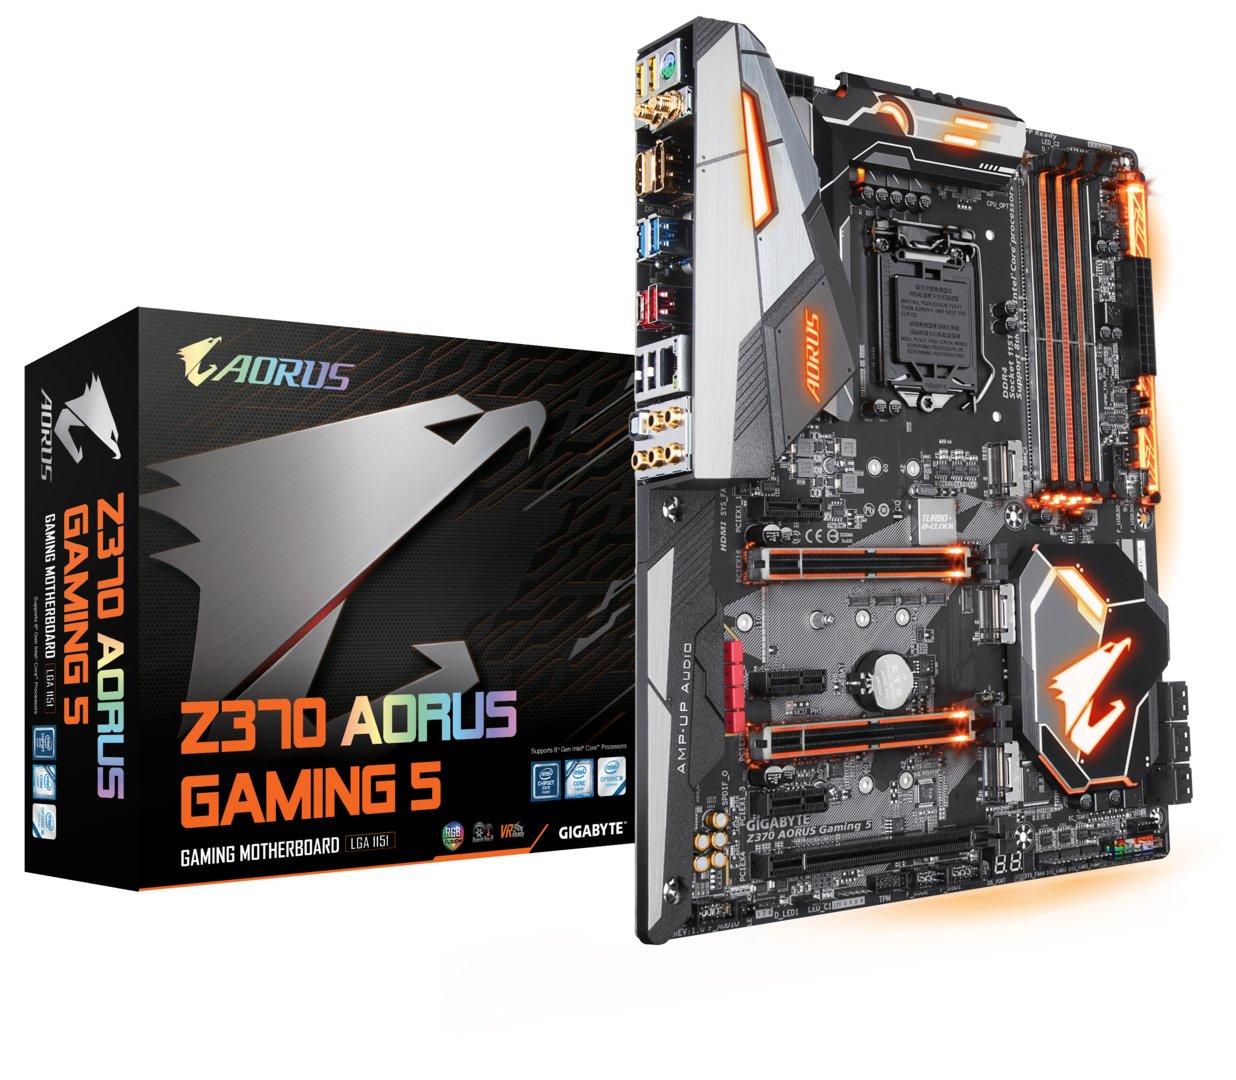 Gigabyte Aorus Z370 Gaming 5